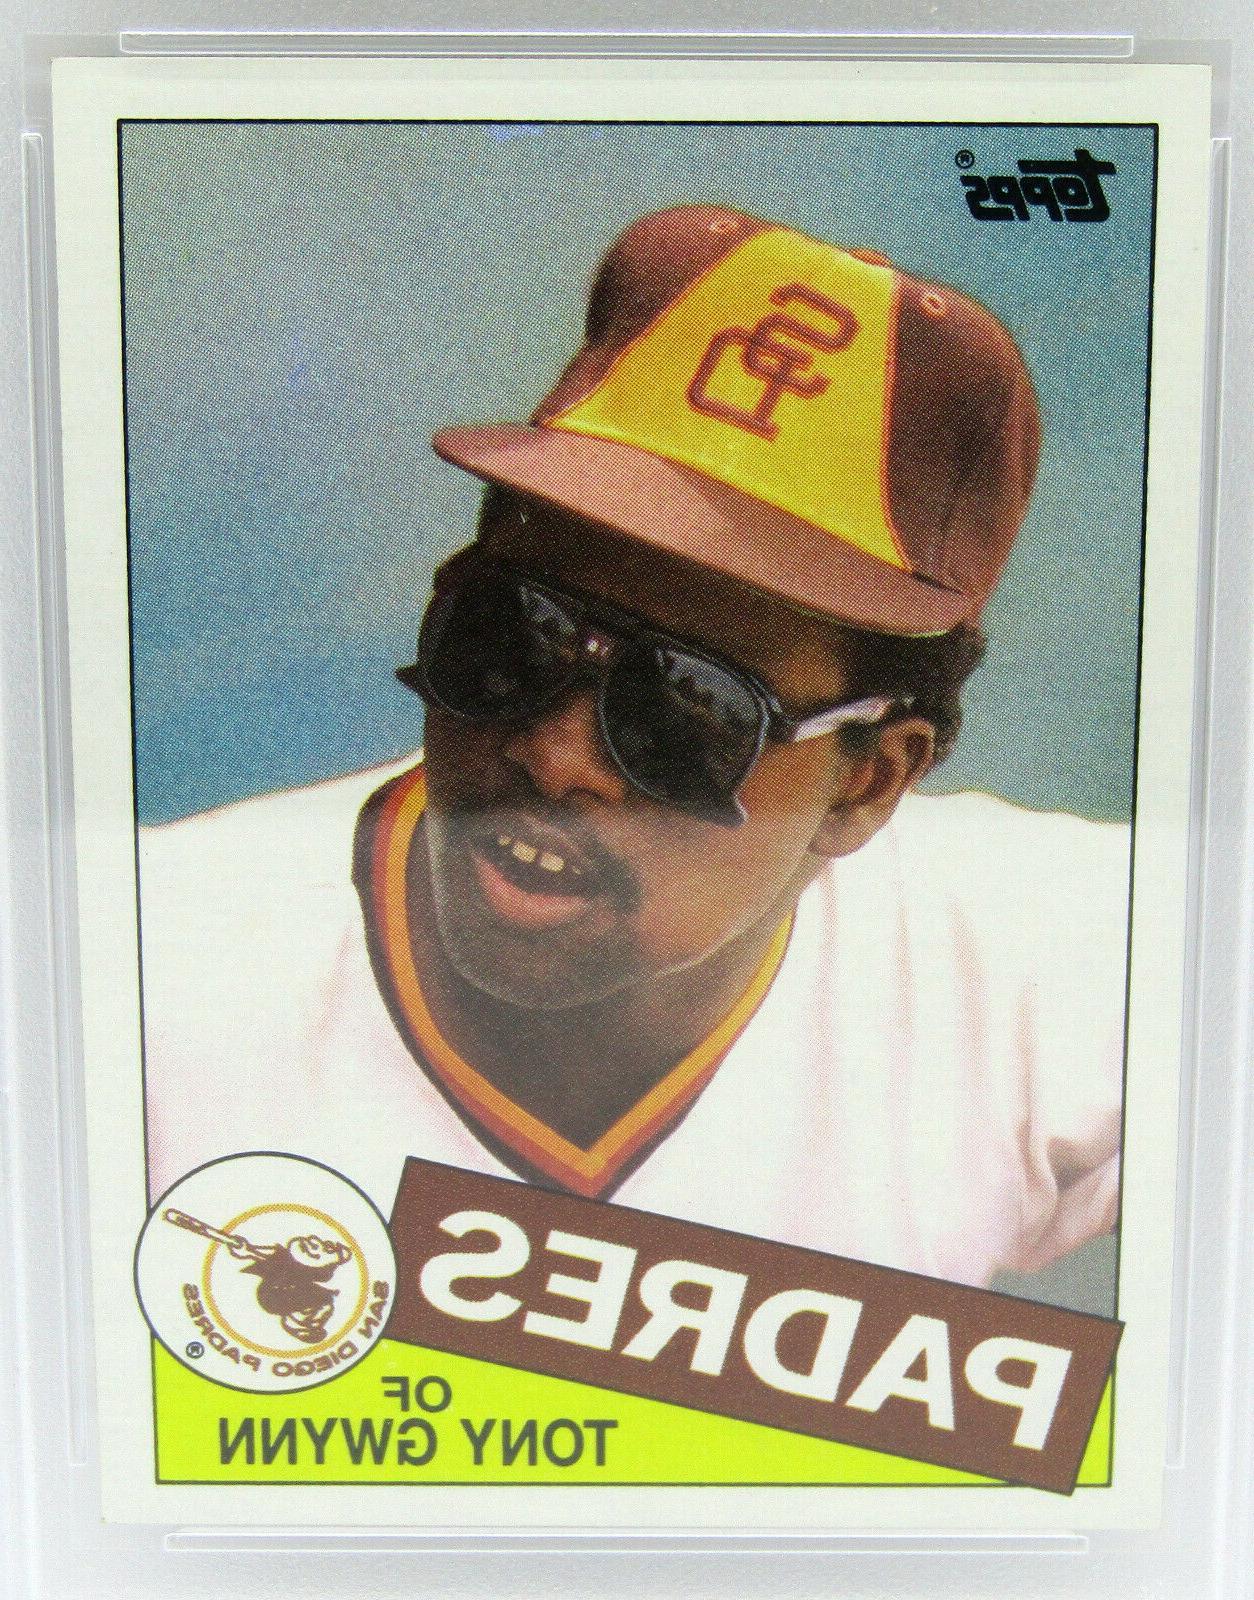 1985 San Diego Padres #660 Graded NM-MT+